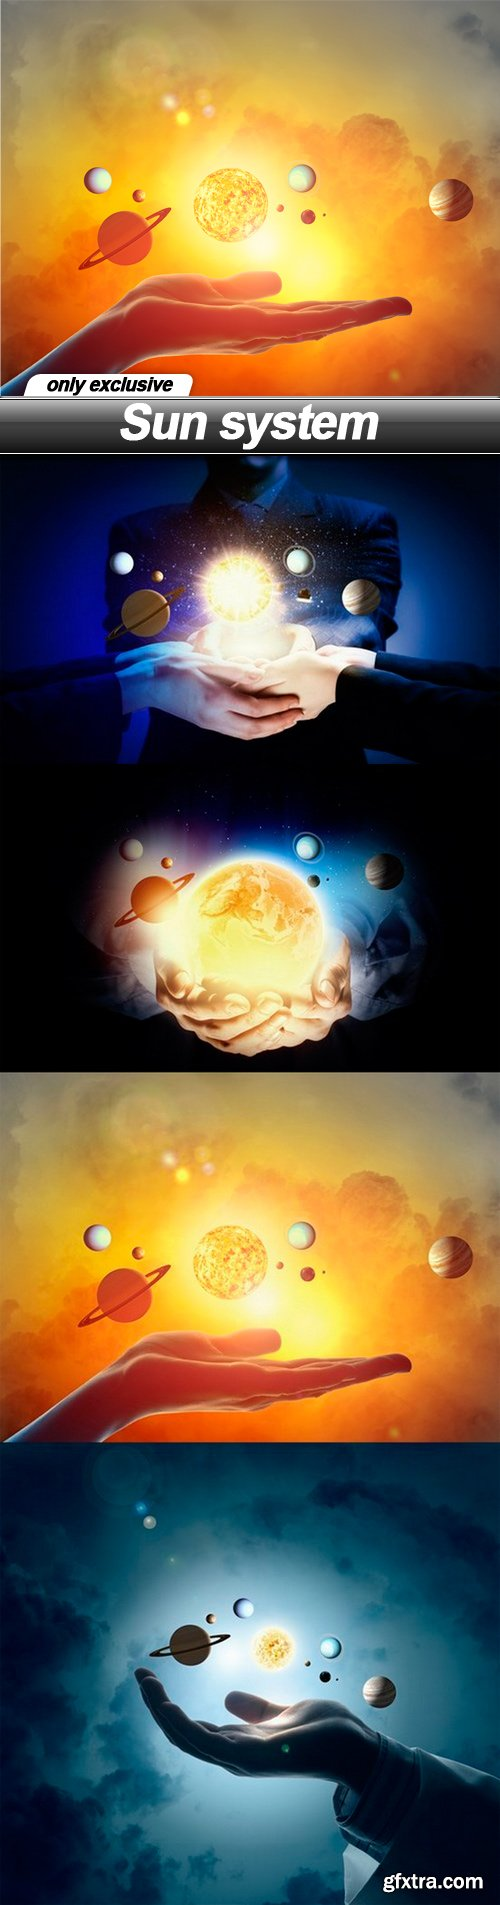 Sun system - 5 UHQ JPEG